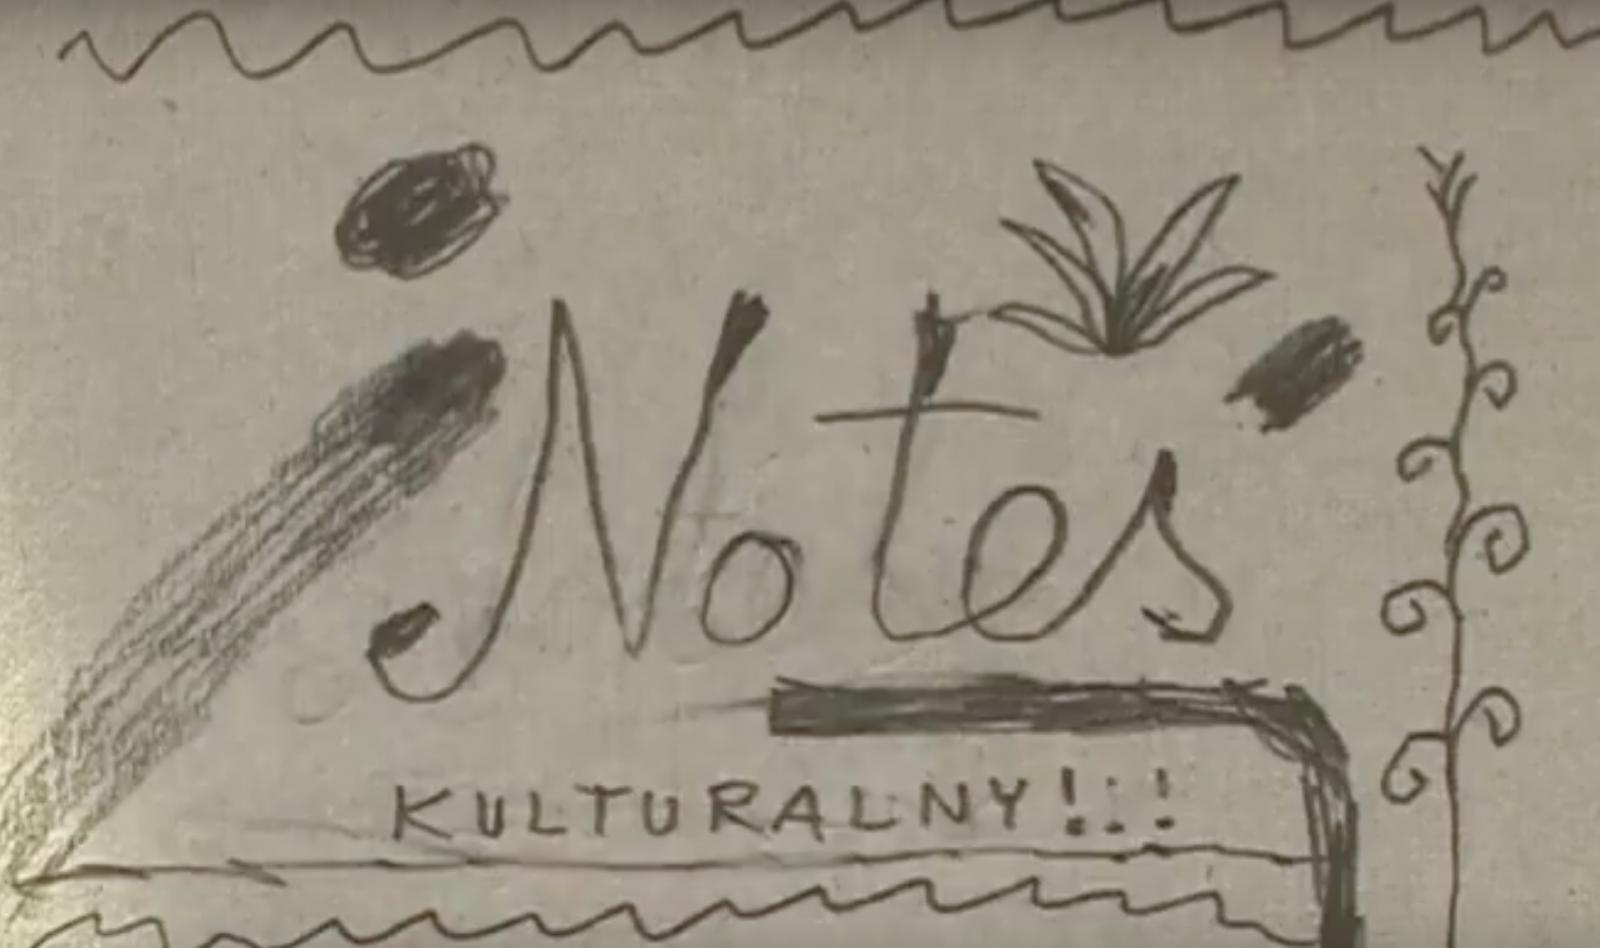 Jon Dobie & Miroslav Wanek - Notes Kulturalny odc. 2